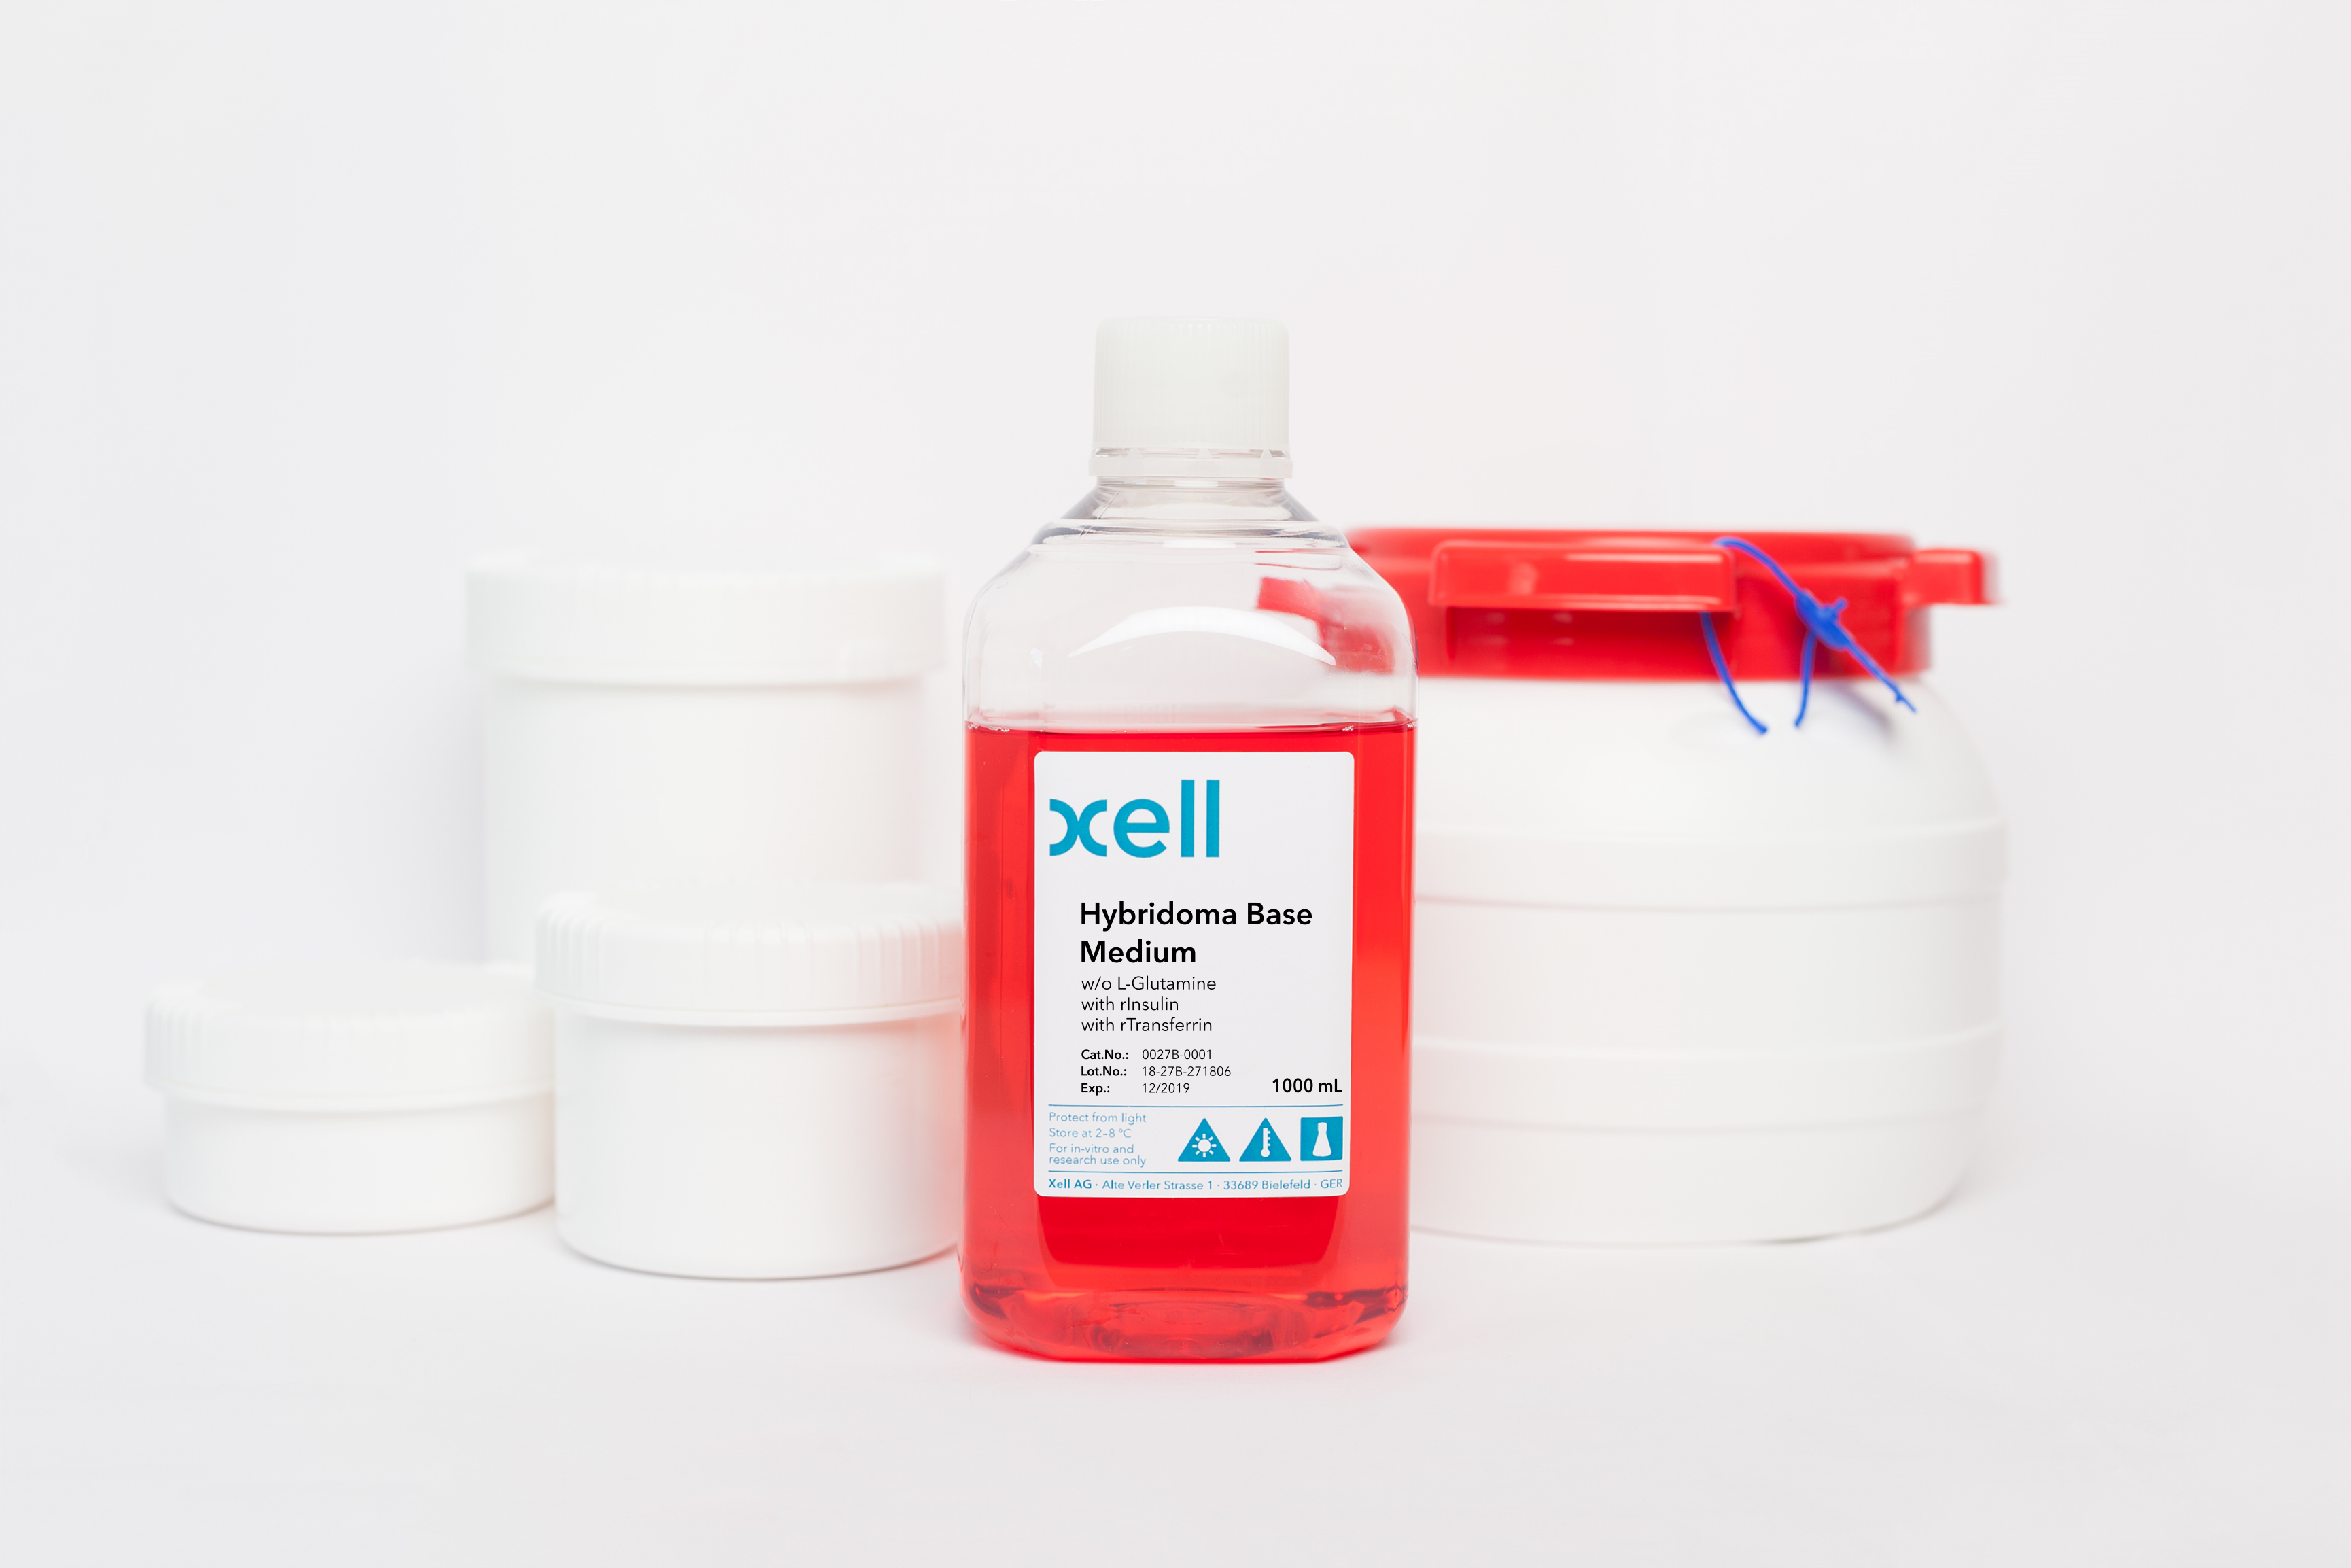 Hybridoma Base Medium | Cell culture medium